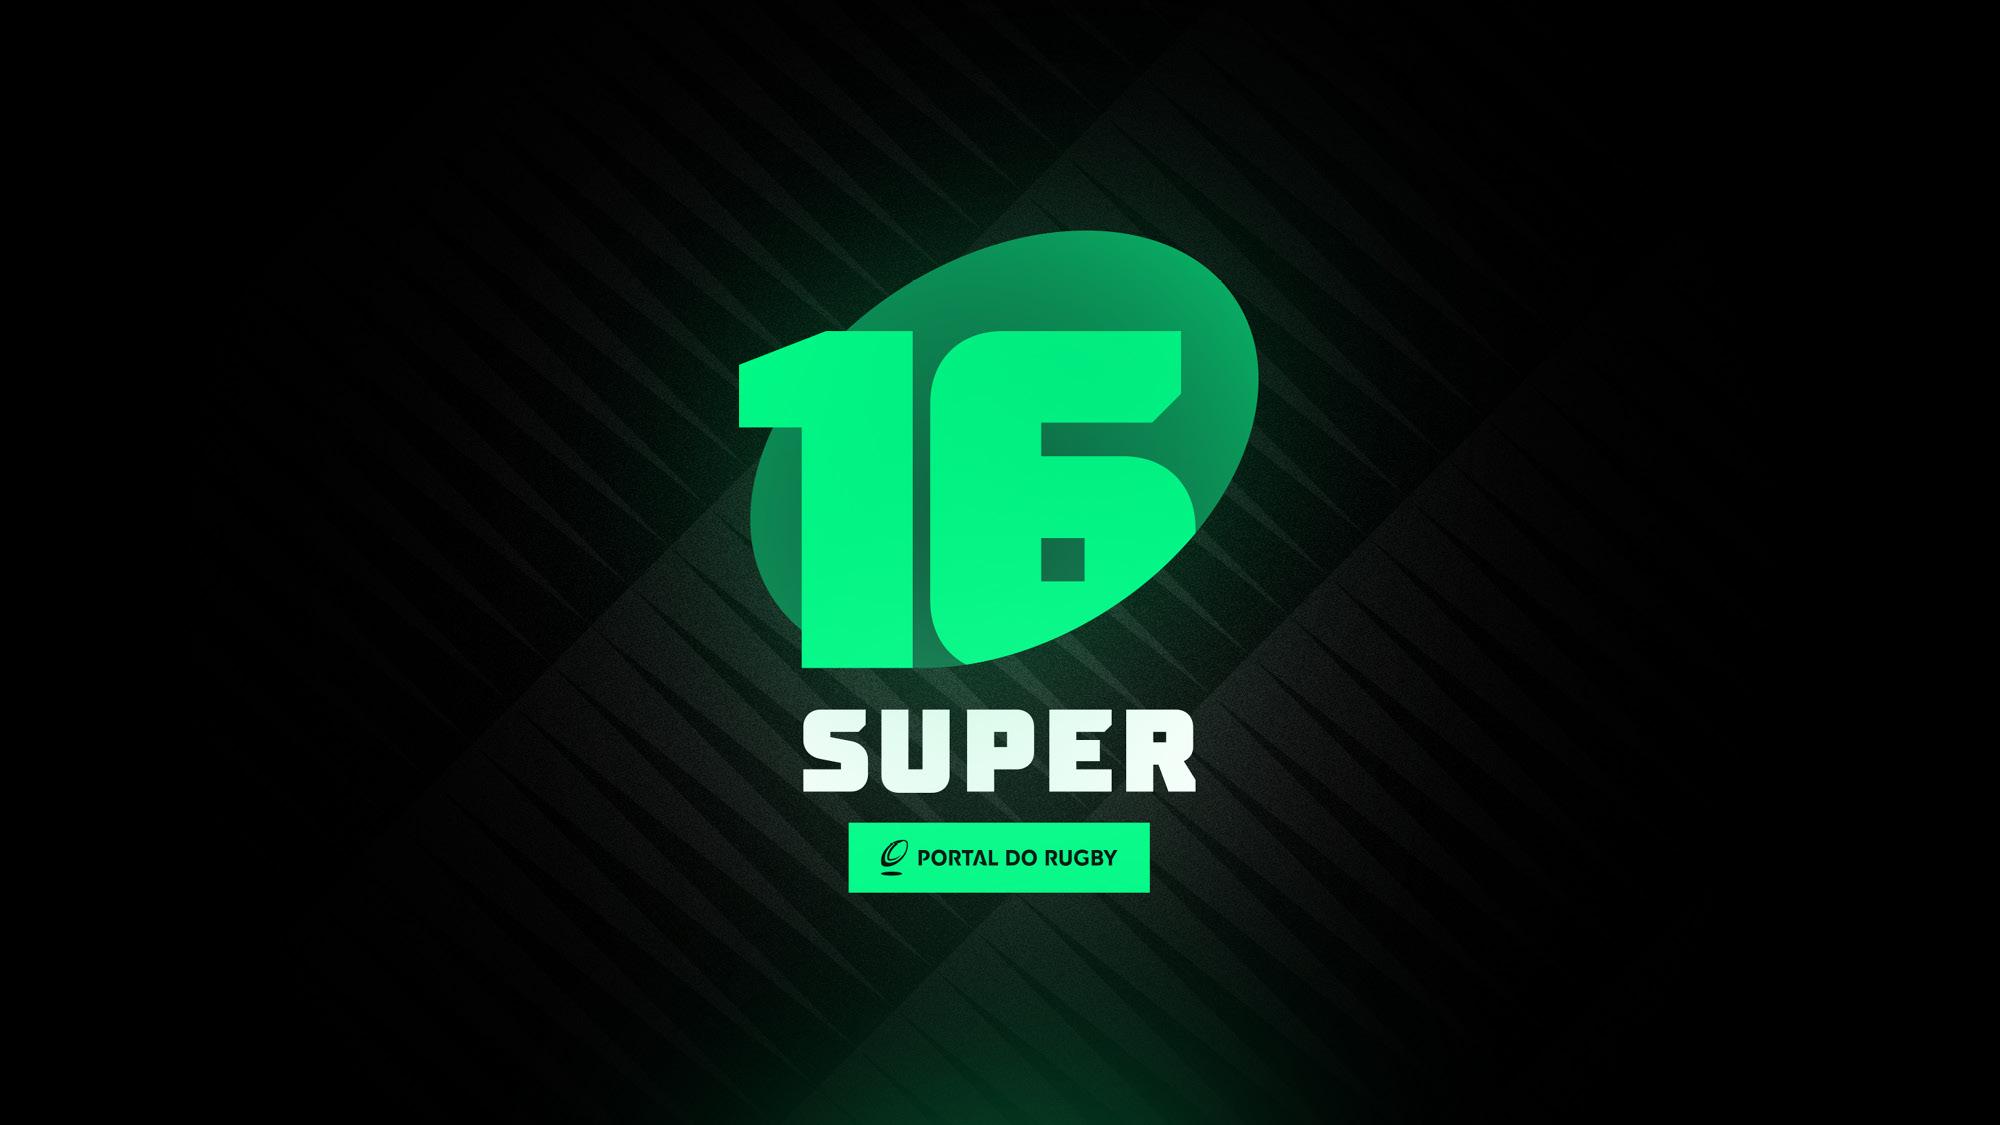 Nacione-Branding-Portal-do-Rugby34